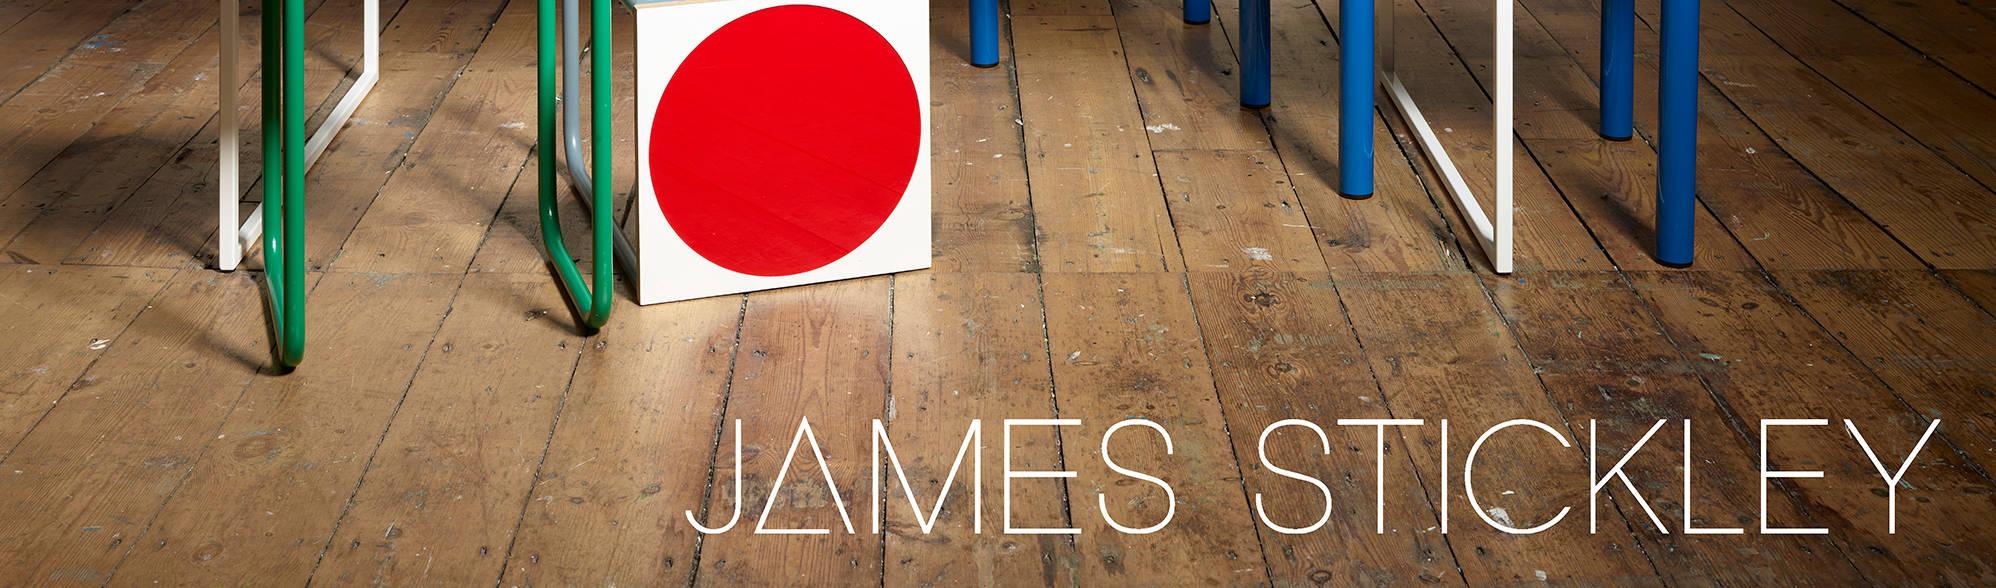 James Stickley